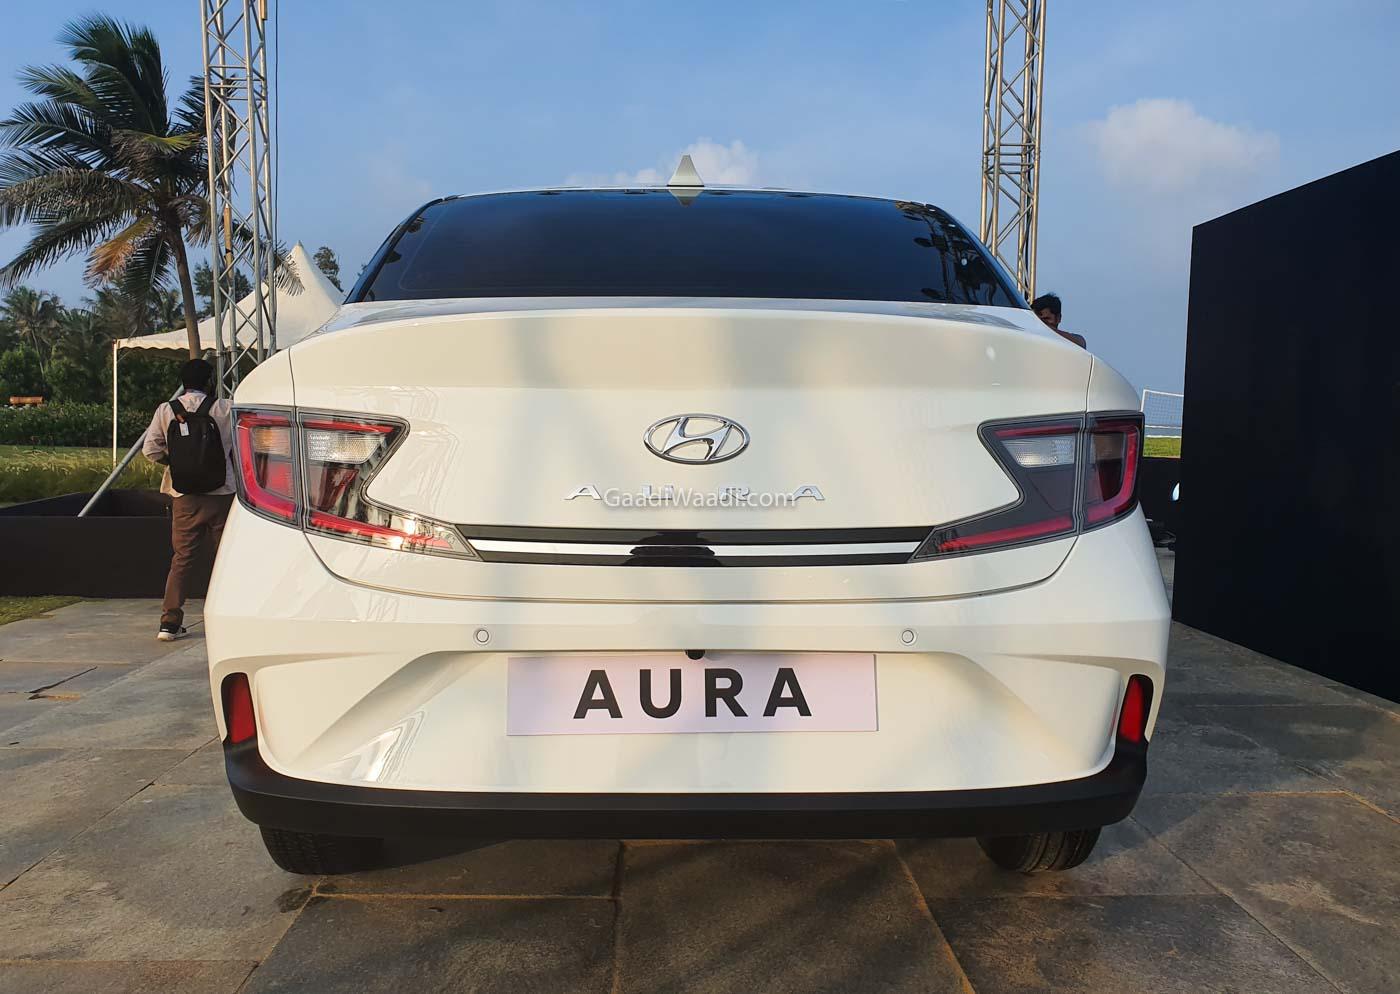 Compact Sedan May 2020 Sales Analysis – Dzire, Aura, Amaze, Tigor